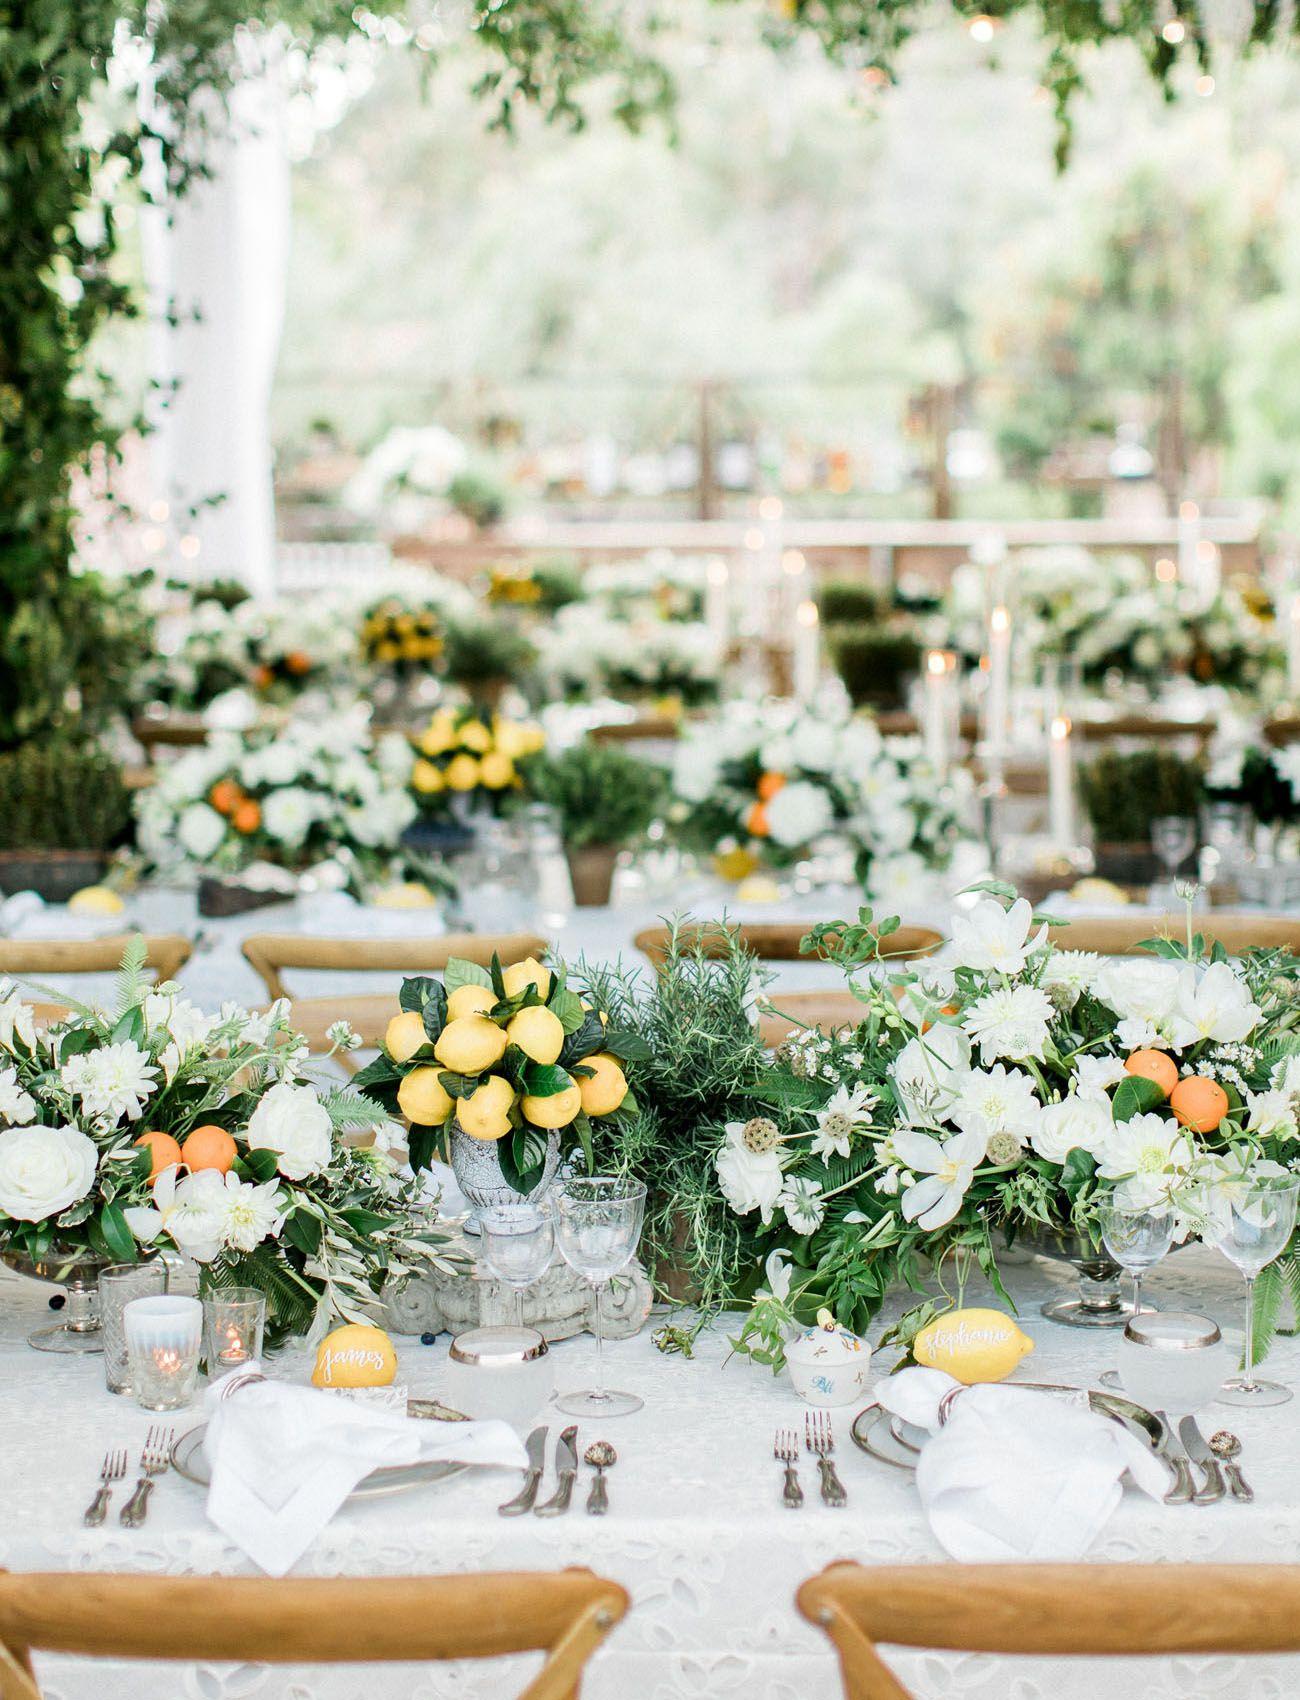 This Supermodel Had The Dreamiest Italian Wedding In Orange County